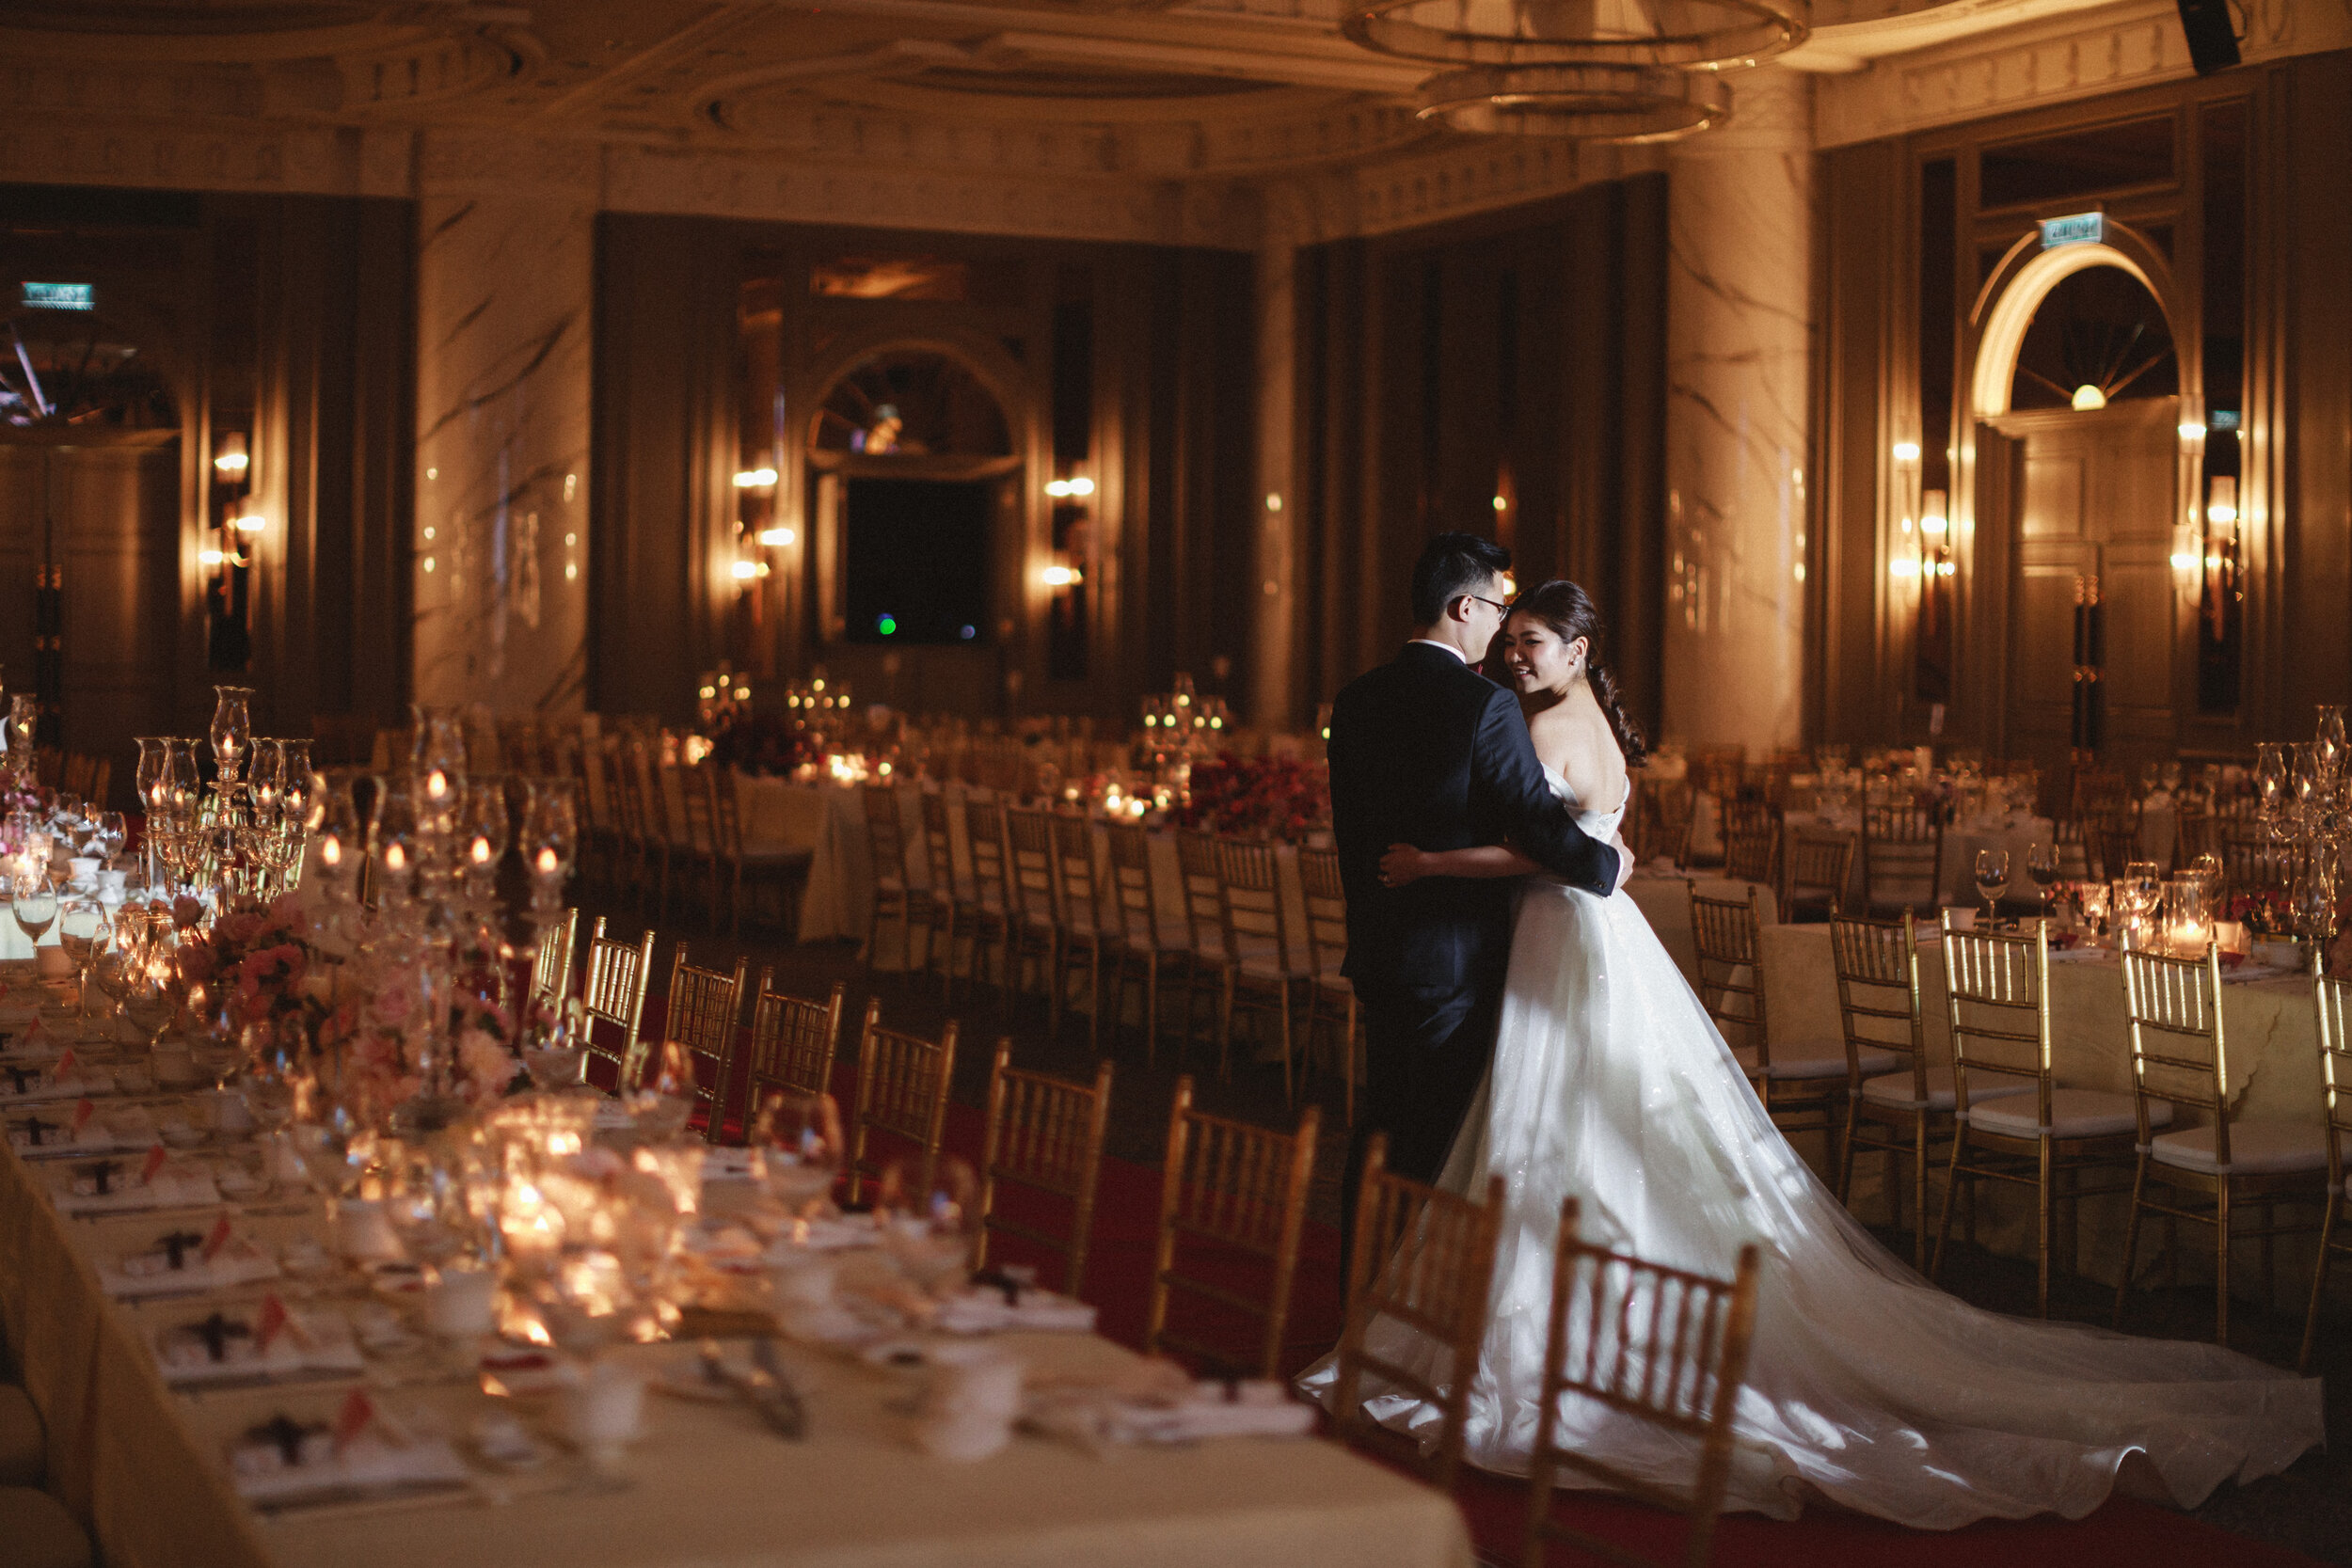 SHENG & YIN - Grand Wedding Reception at JW Marriot